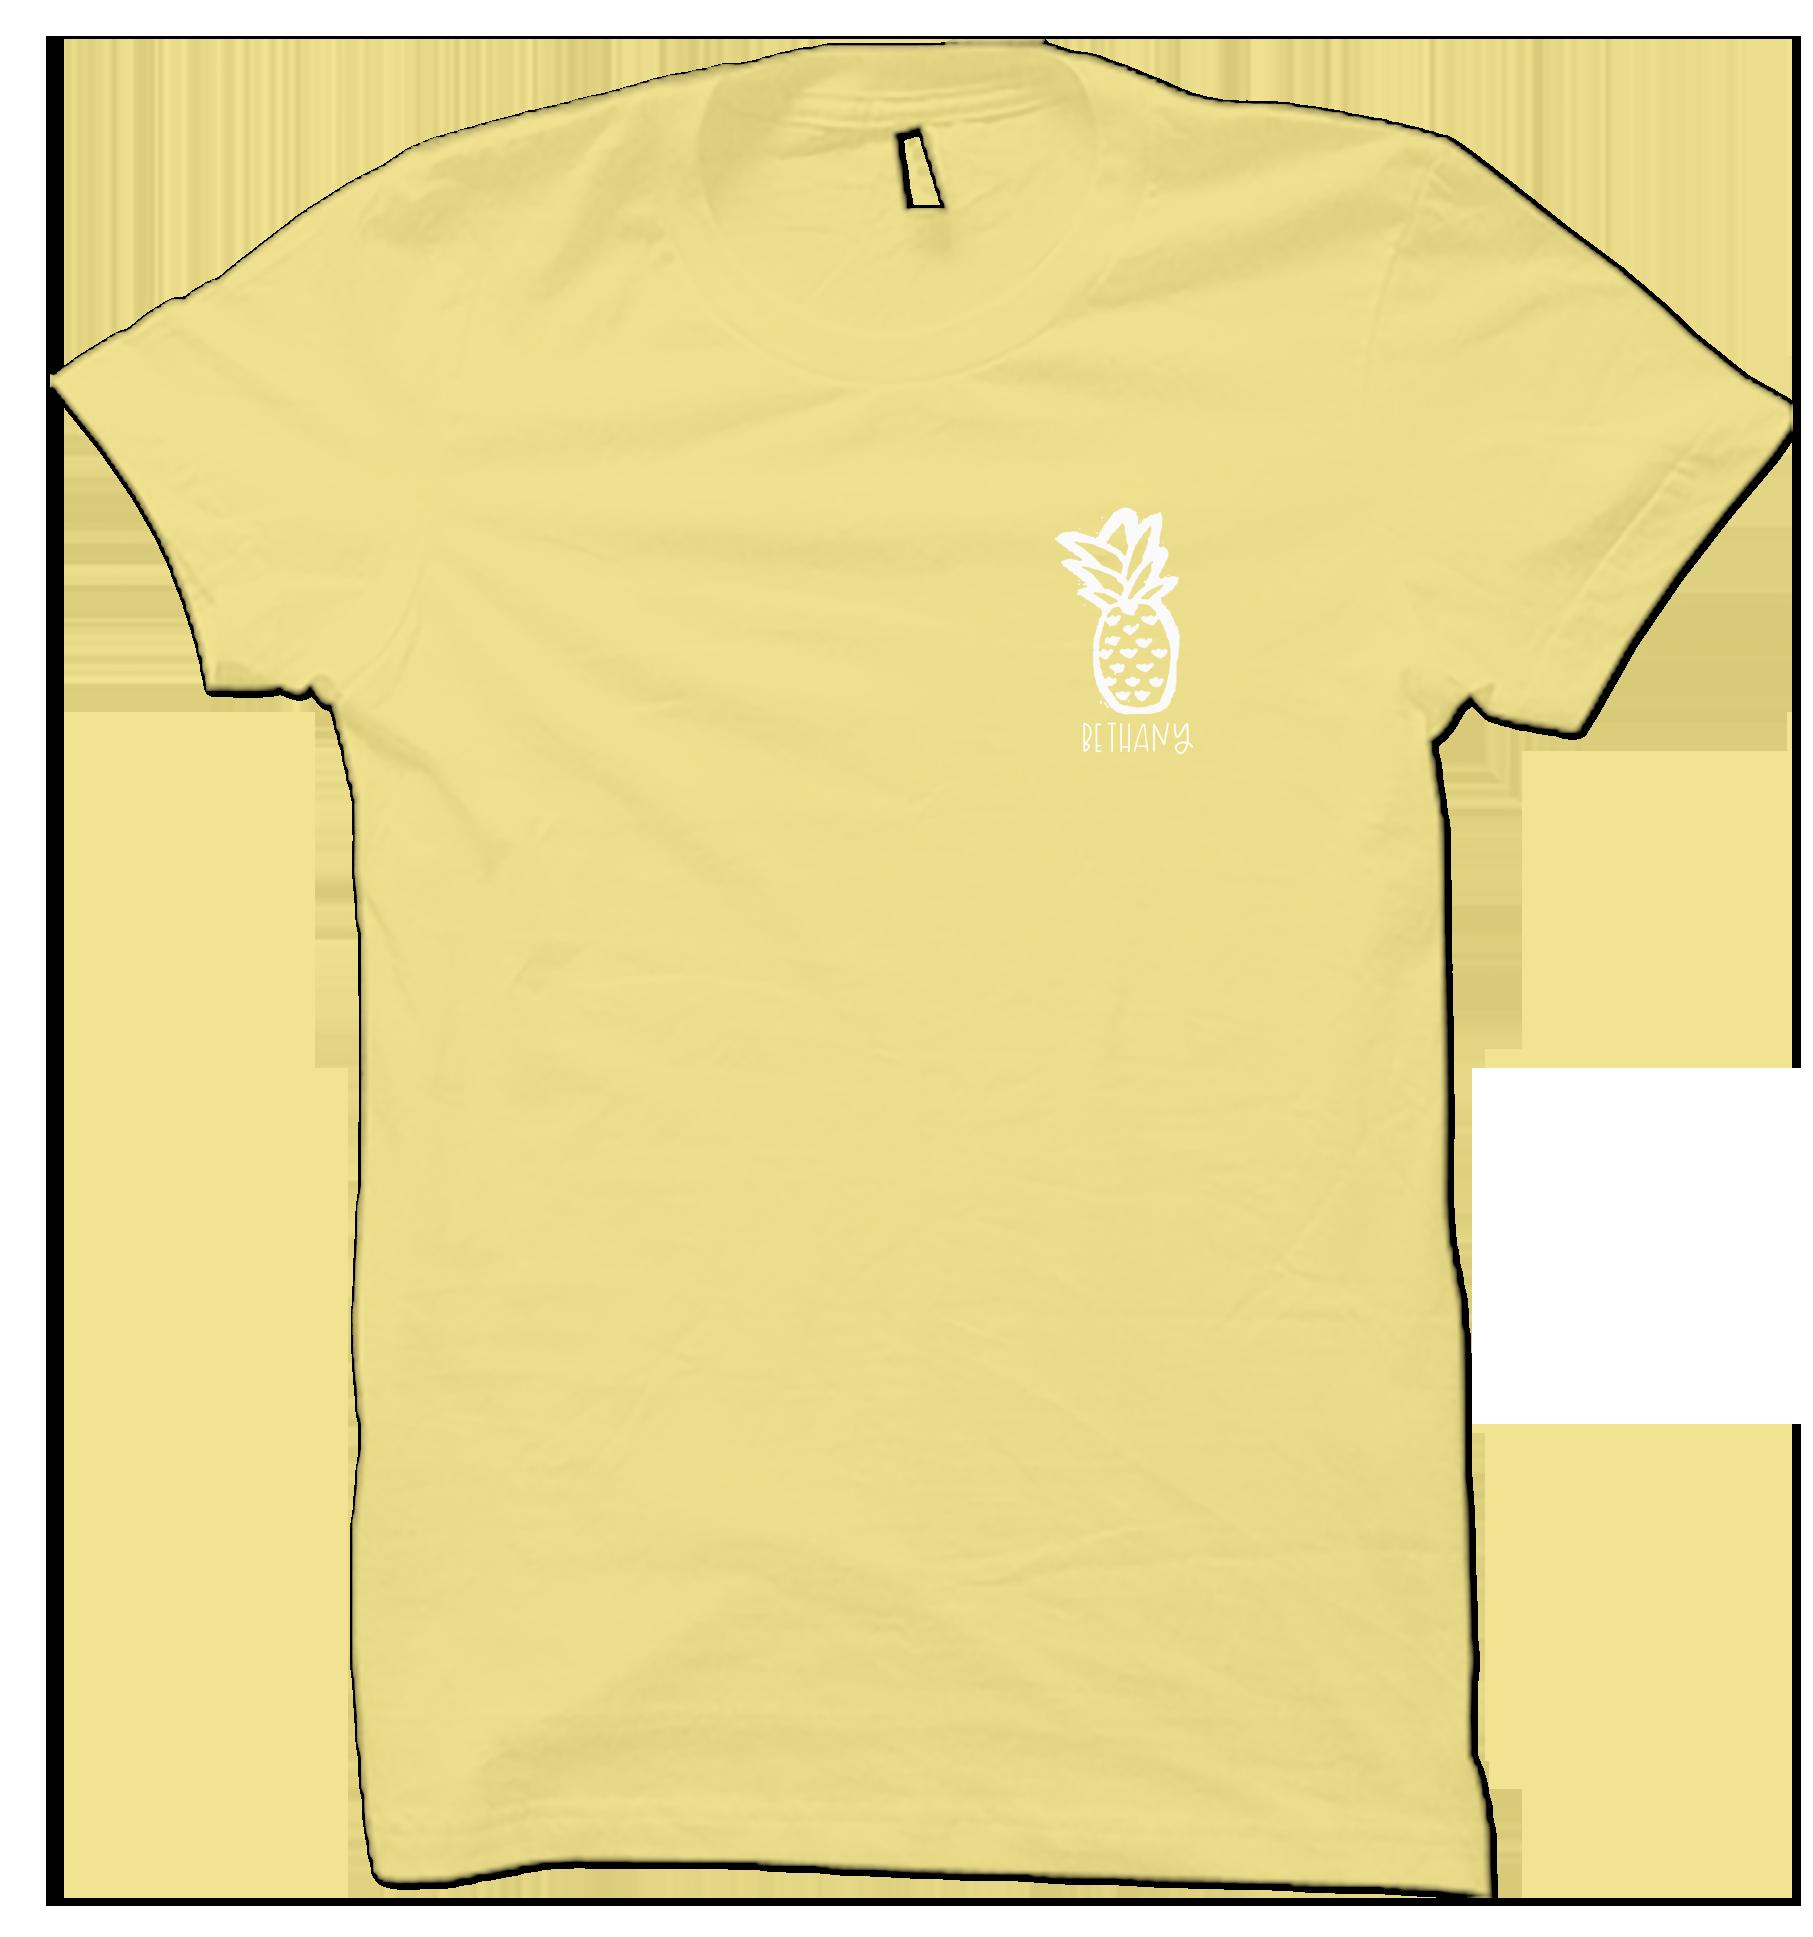 MS Cheer 18-19 - Banana FT